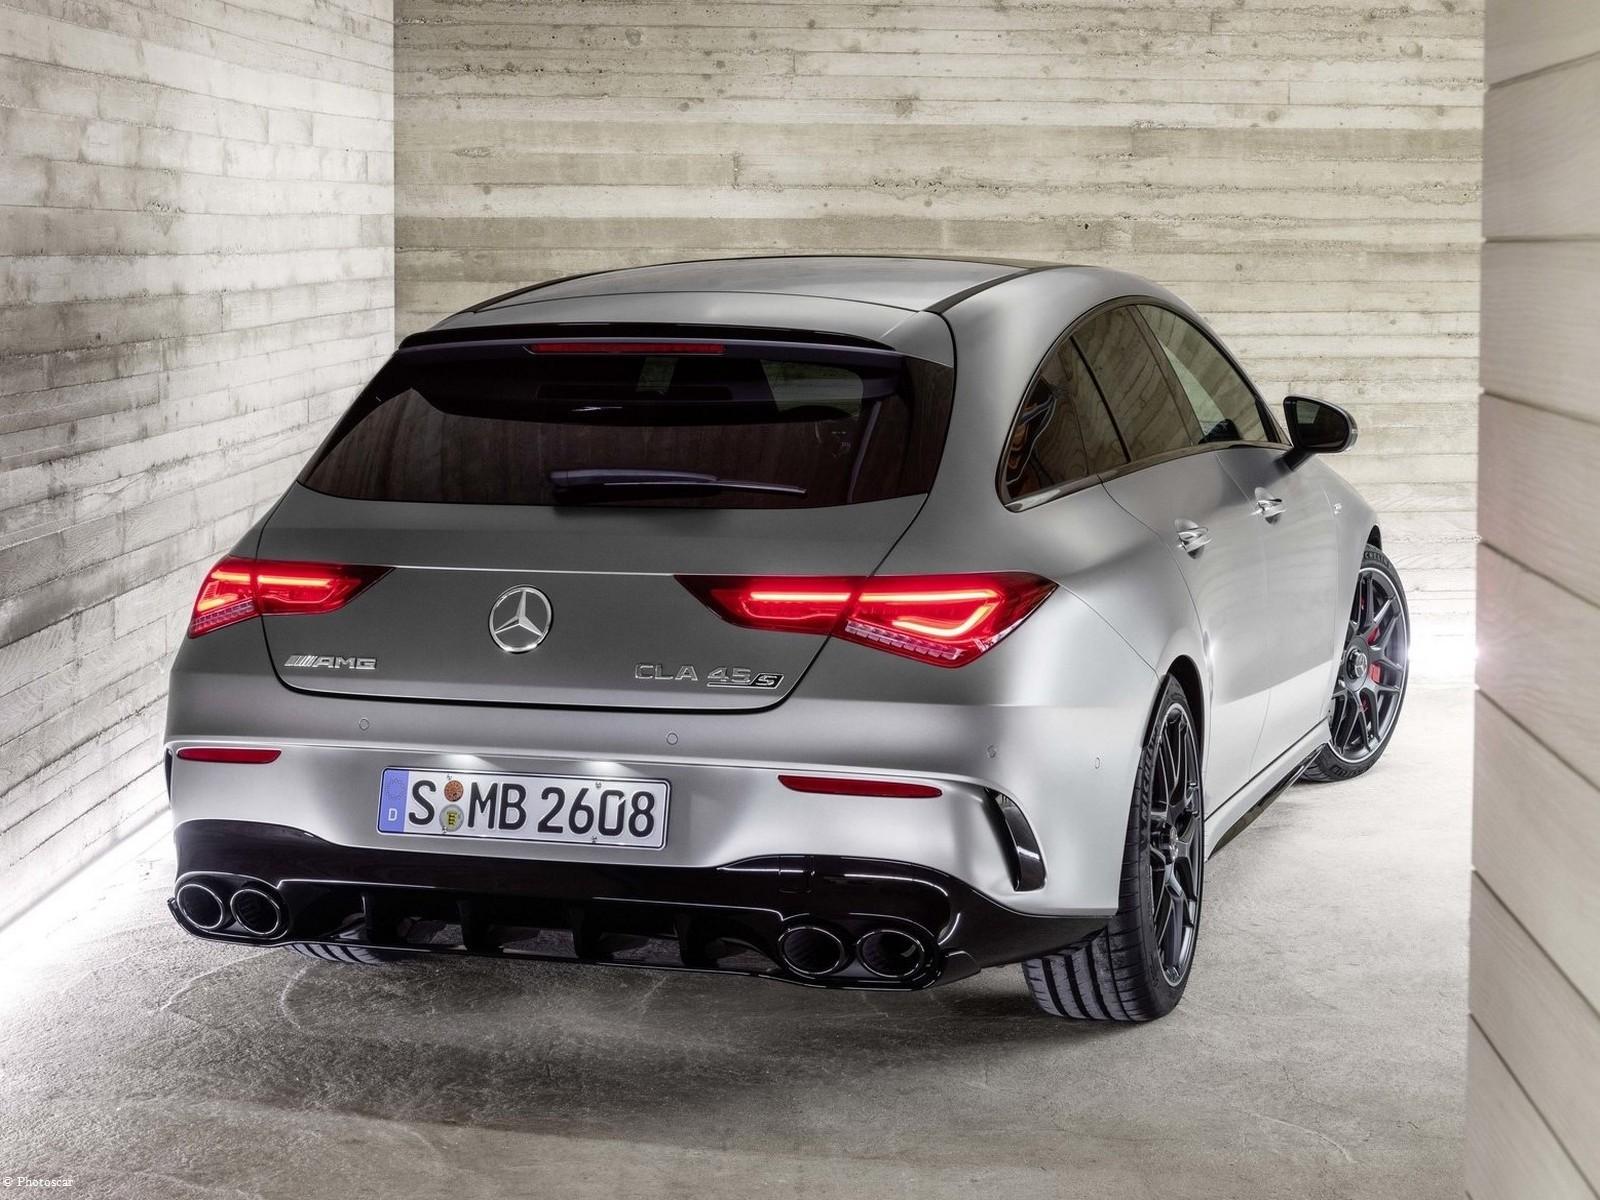 Mercedes AMG CLA45 S 4Matic Shooting Brake 2020